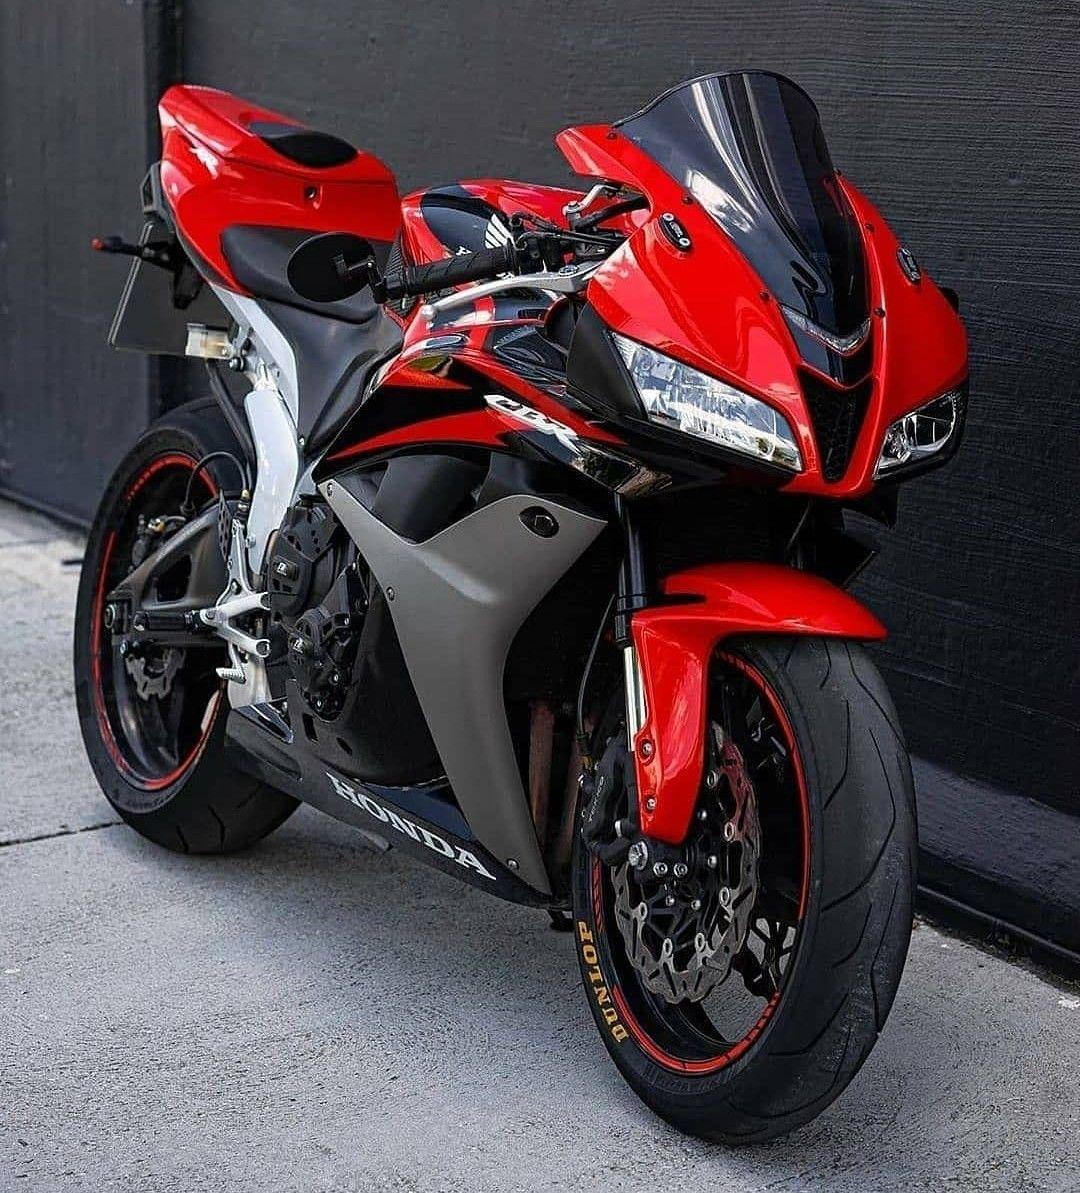 Honda Cbr 600rr Top 5 600cc Bikes Honda Sport Bikes Honda Motorcycles Cbr Honda Cbr